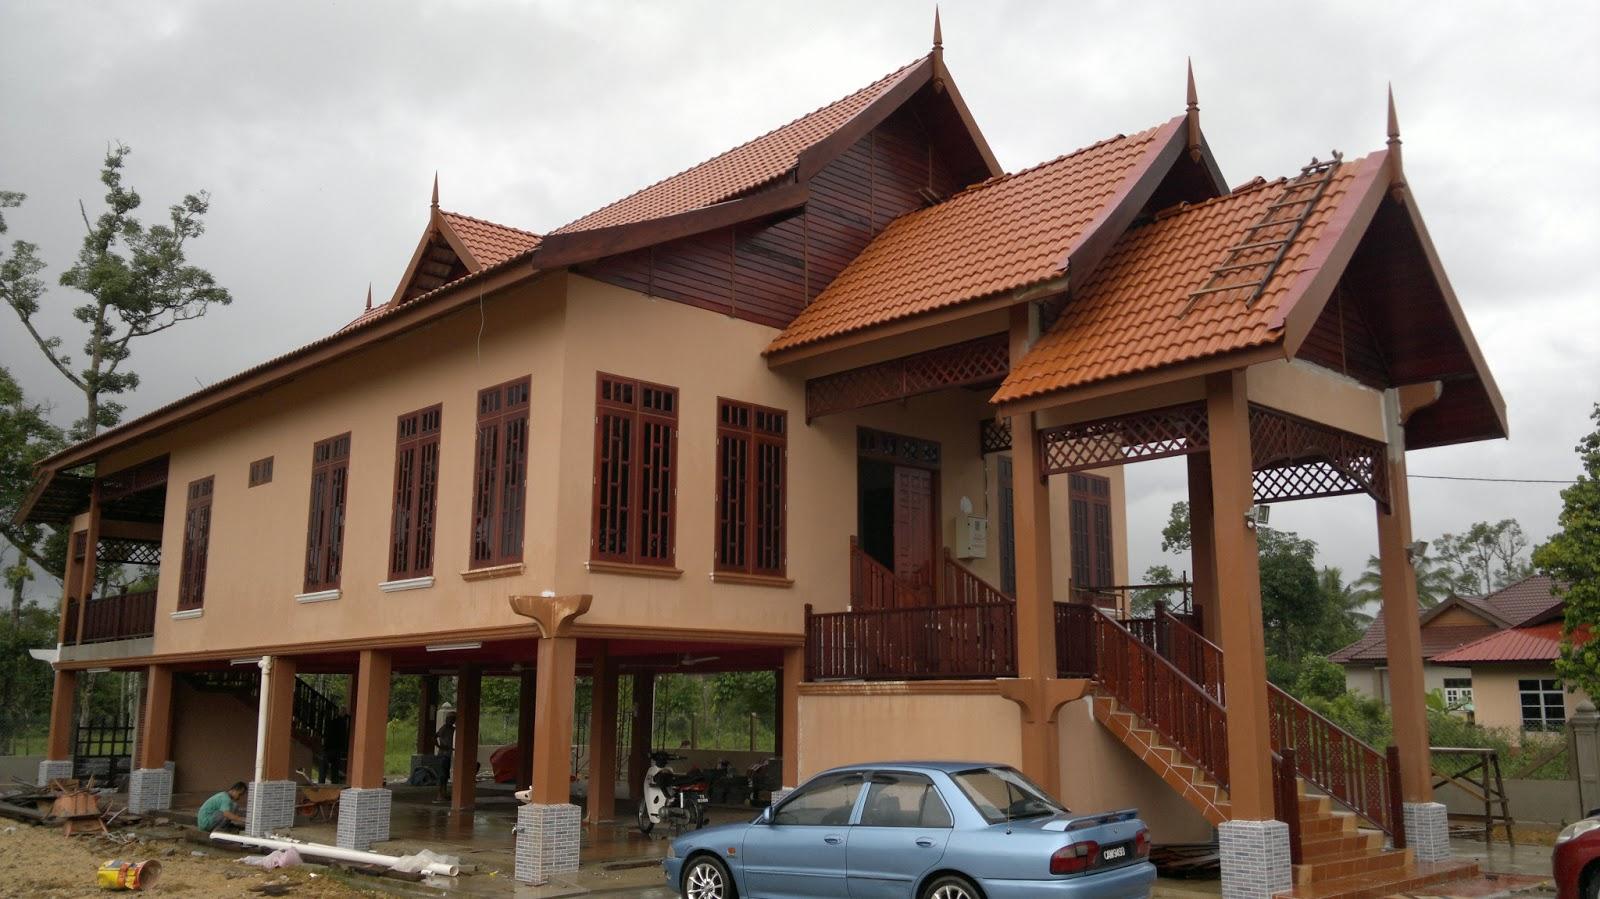 Hartanah Property Terengganu: Genap 2 tahun 14 Februari 2013